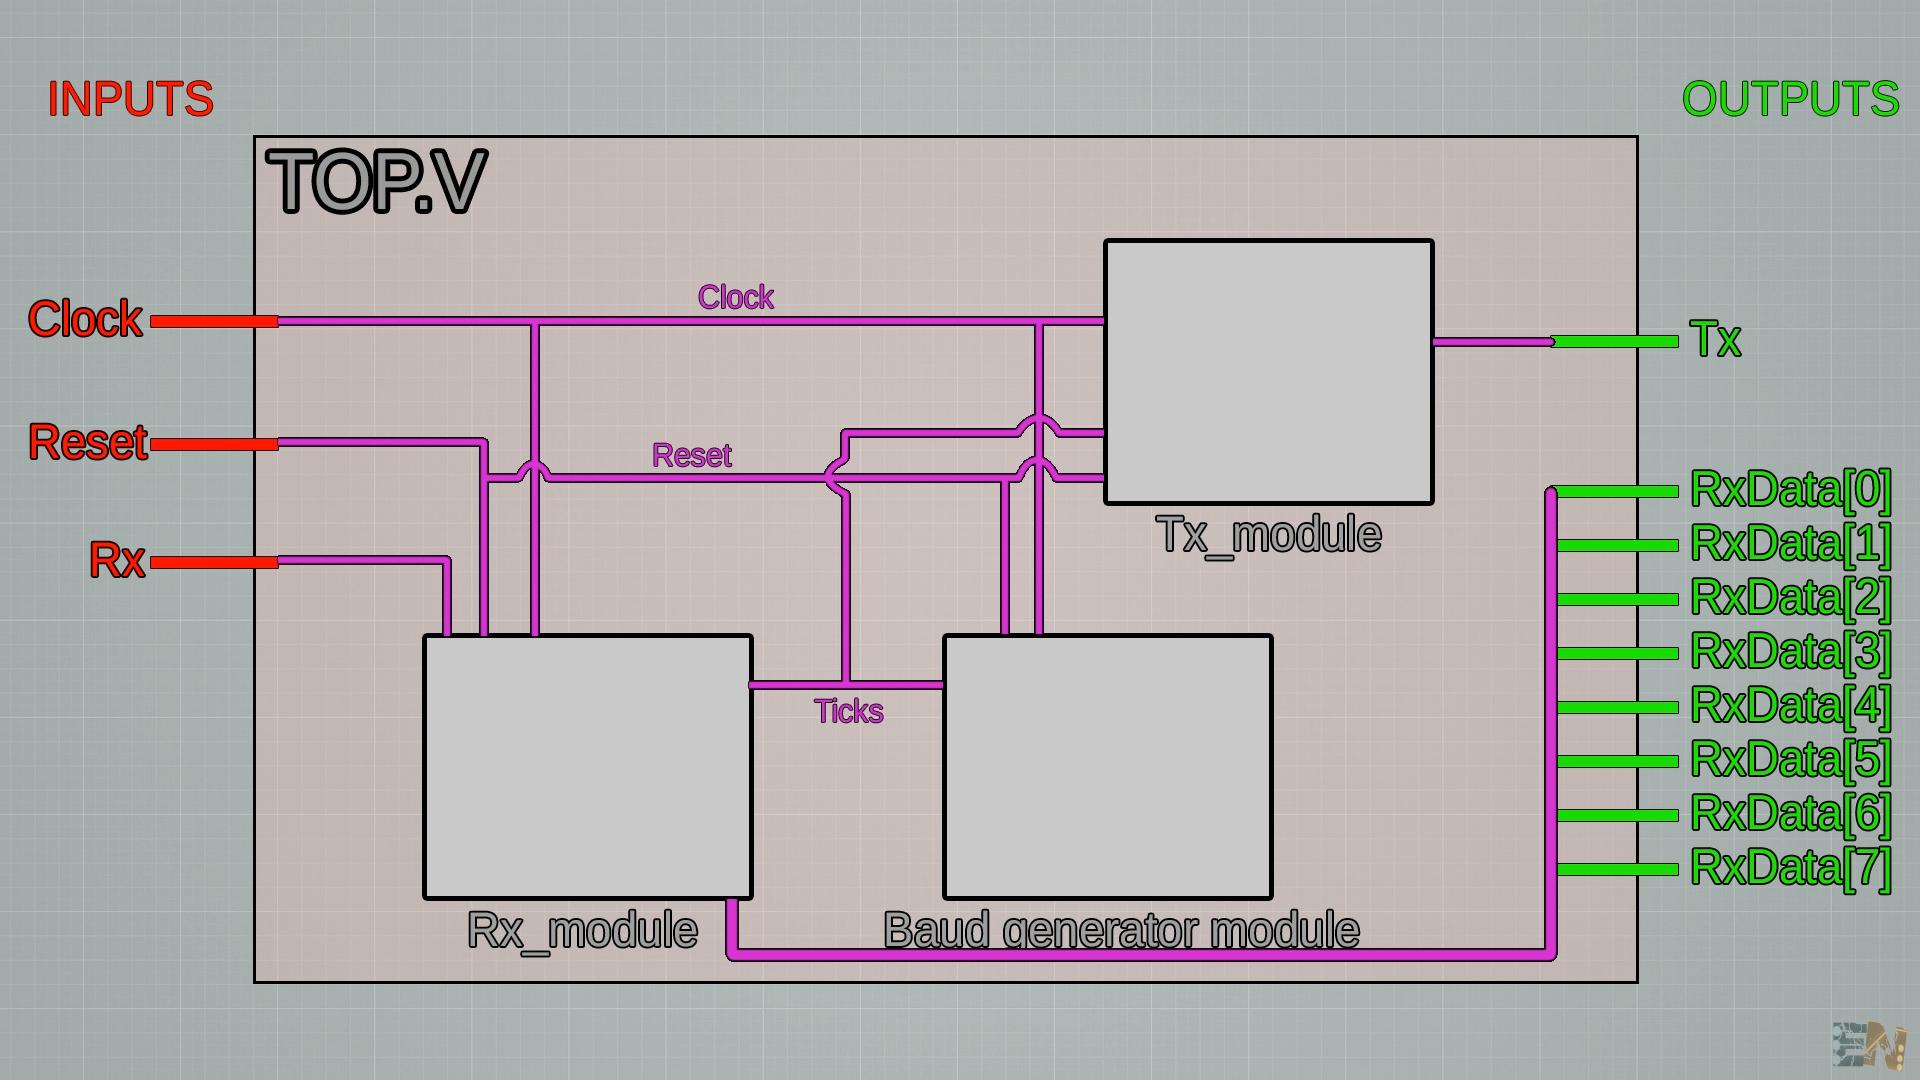 UART verilog code for FPGA baudrate